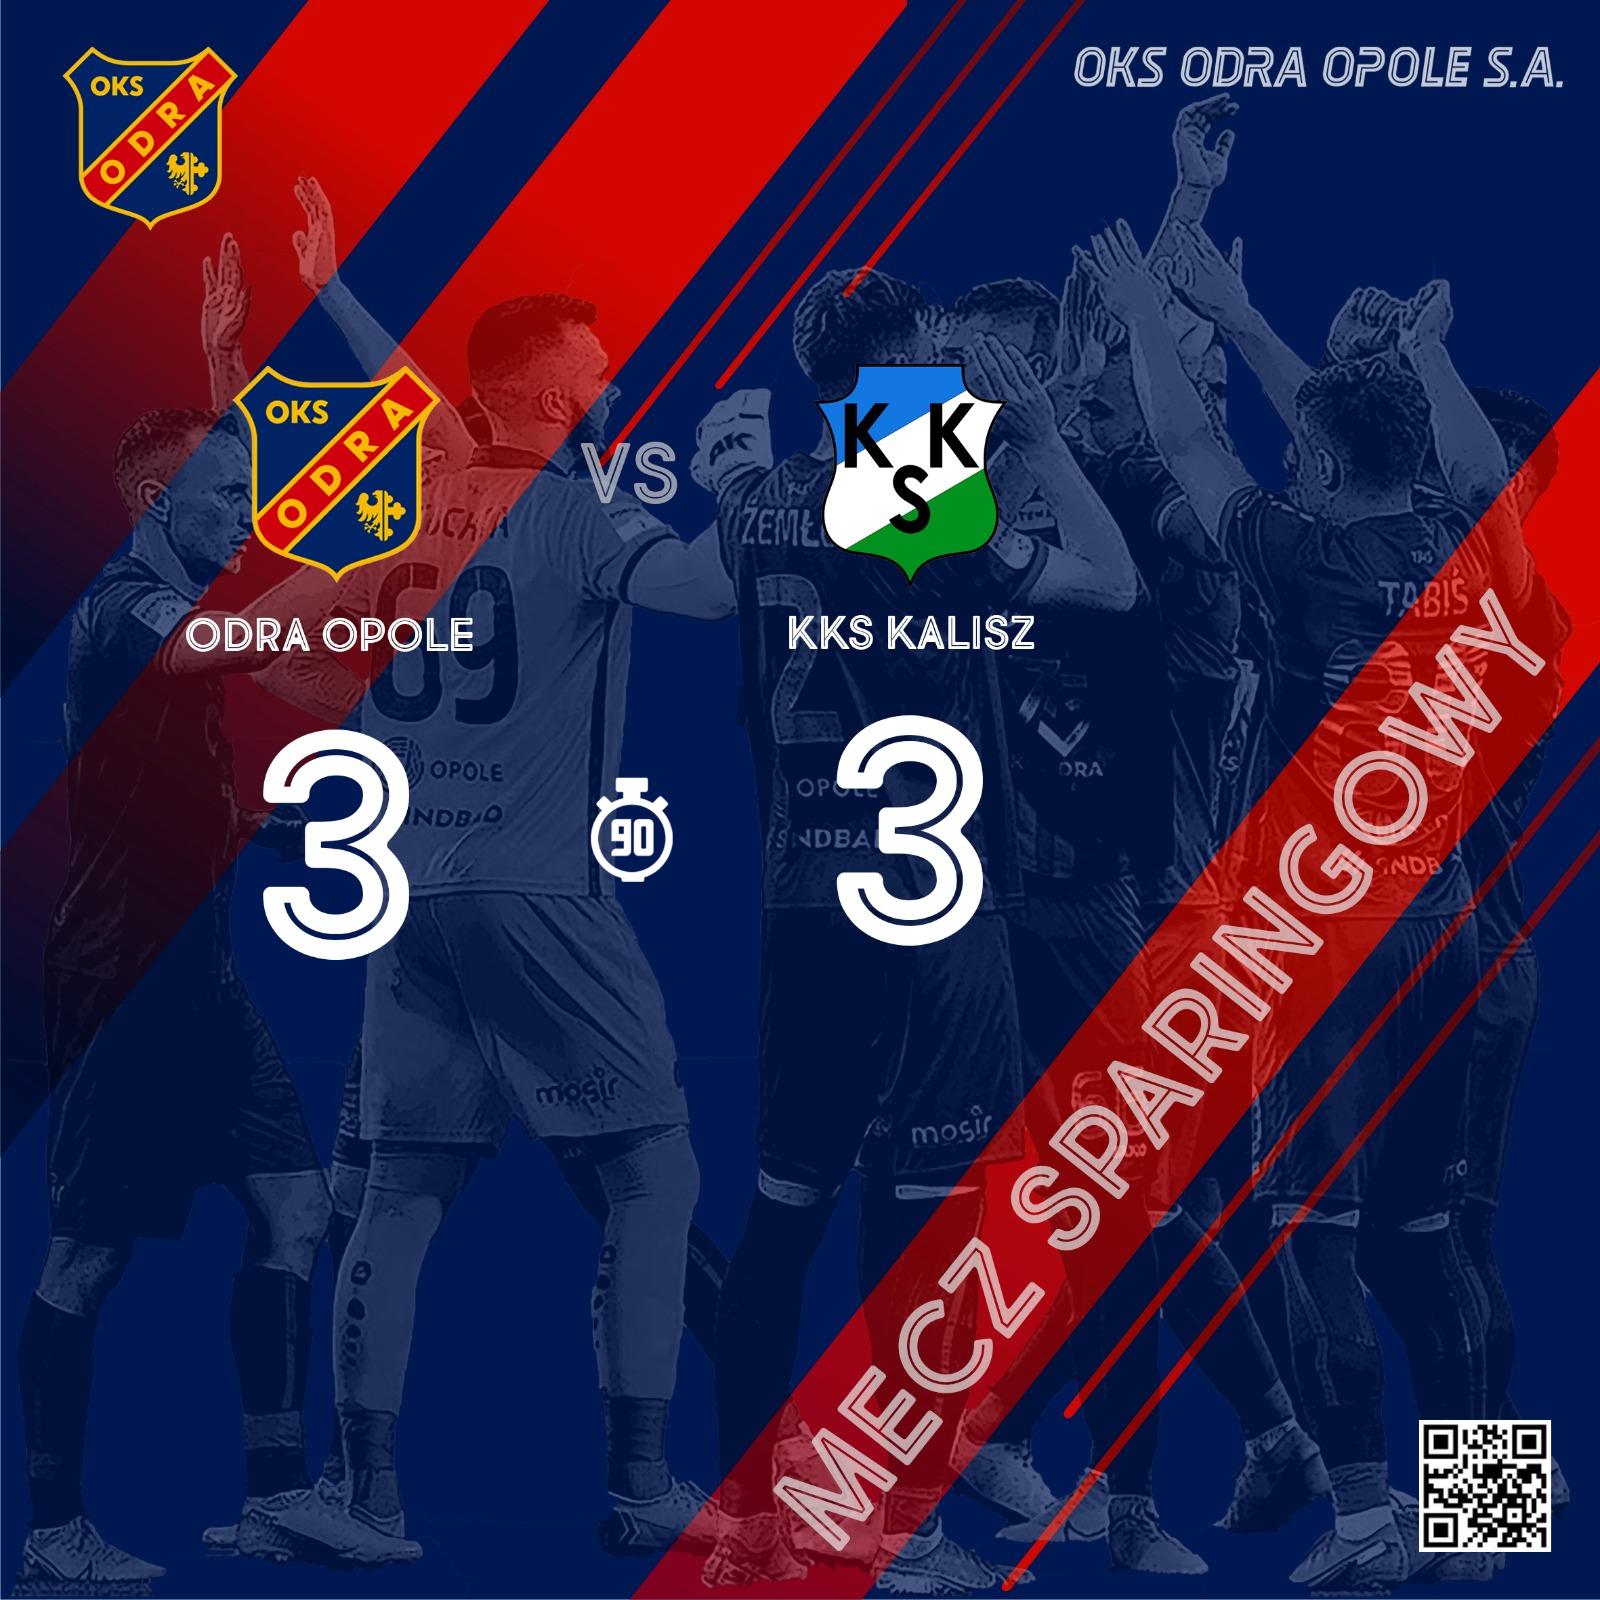 Odra Opole – KKS Kalisz 3-3